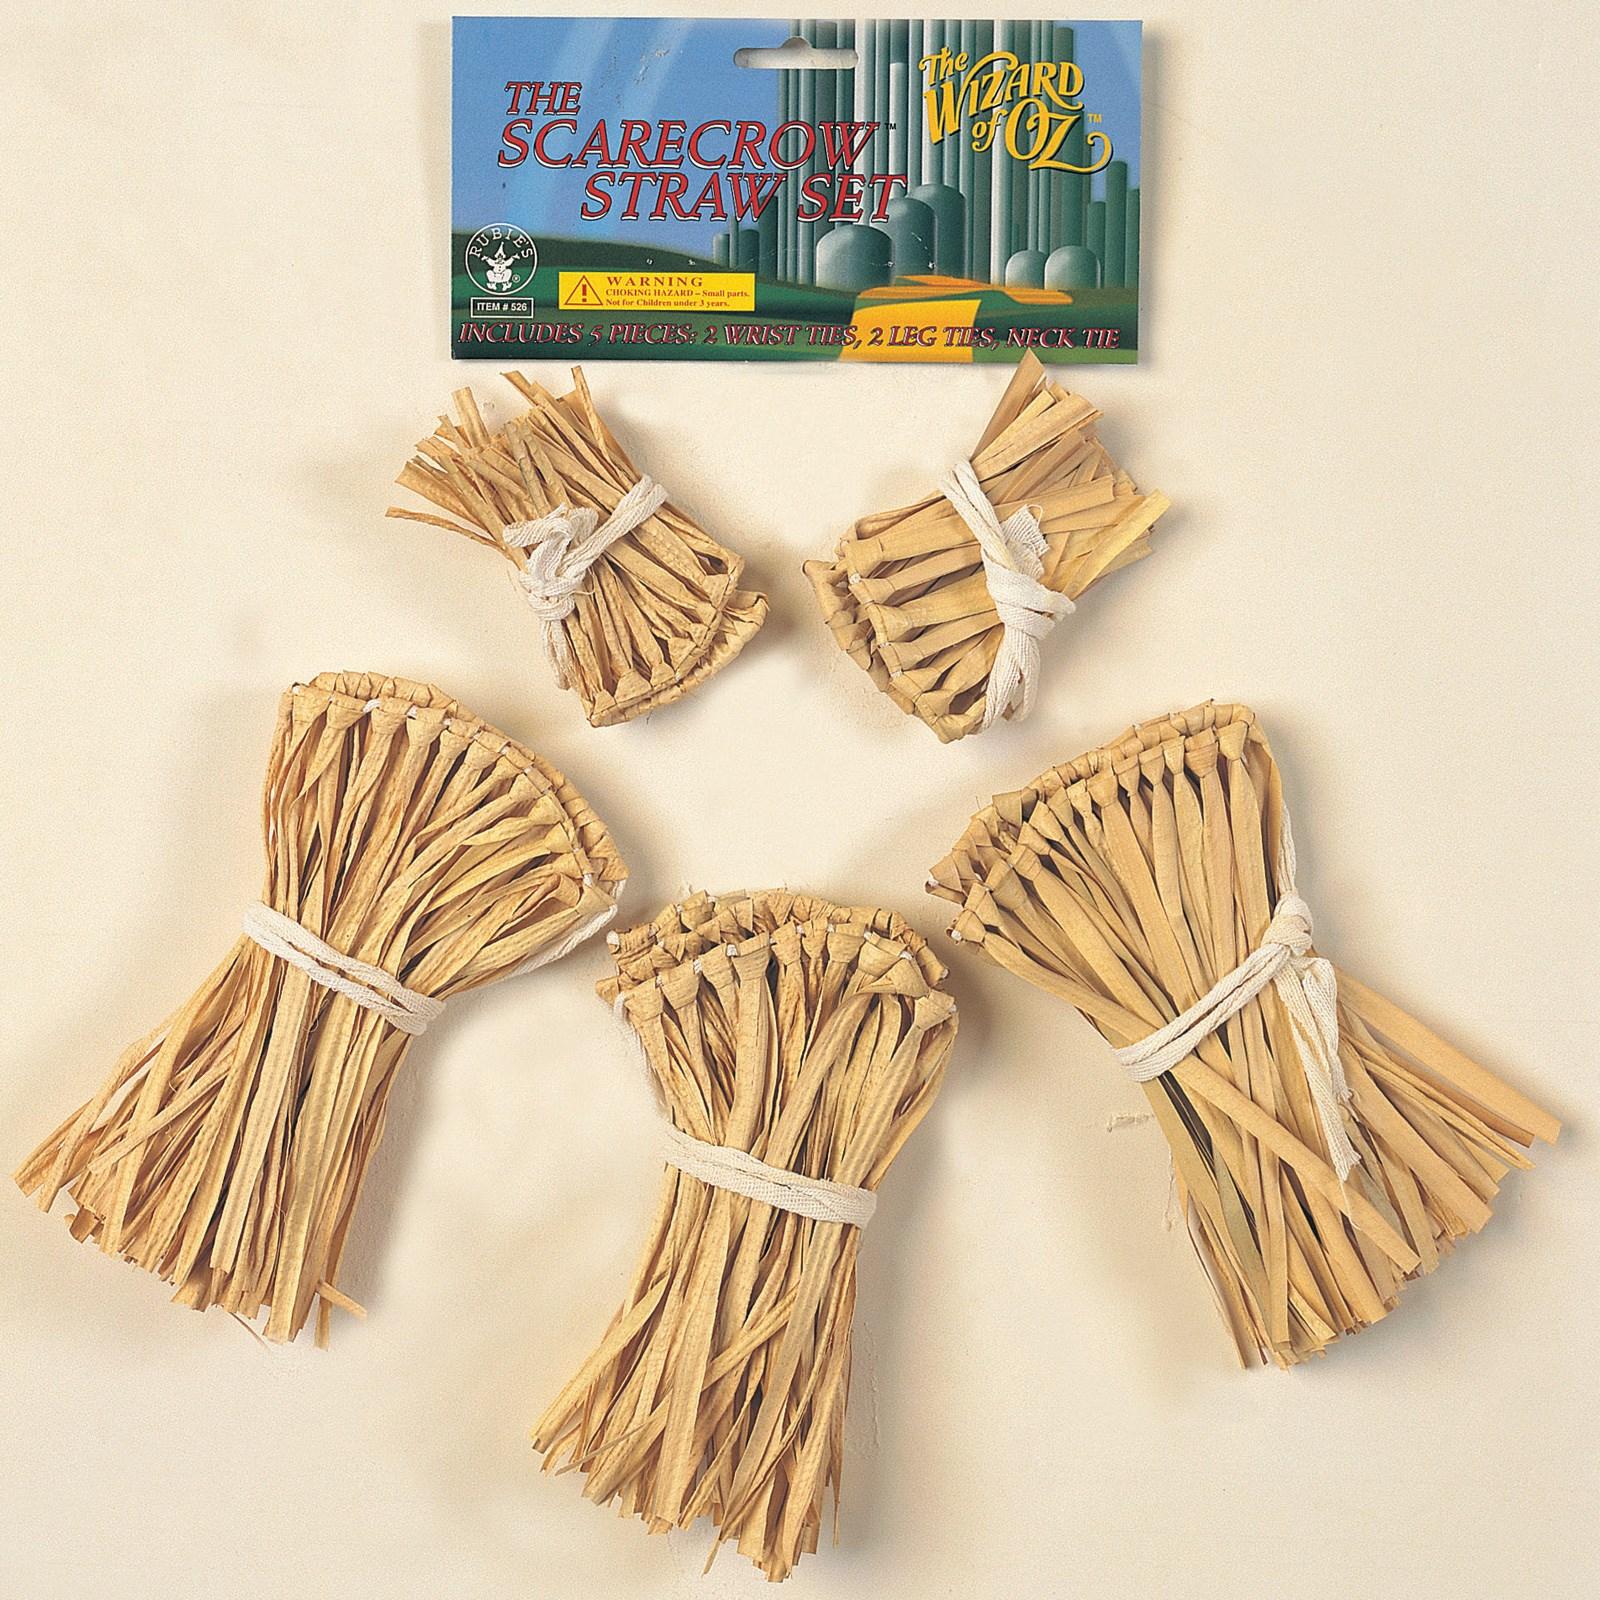 The Wizard of Oz - Scarecrow Straw Accessory Kit | BuyCostumes.com